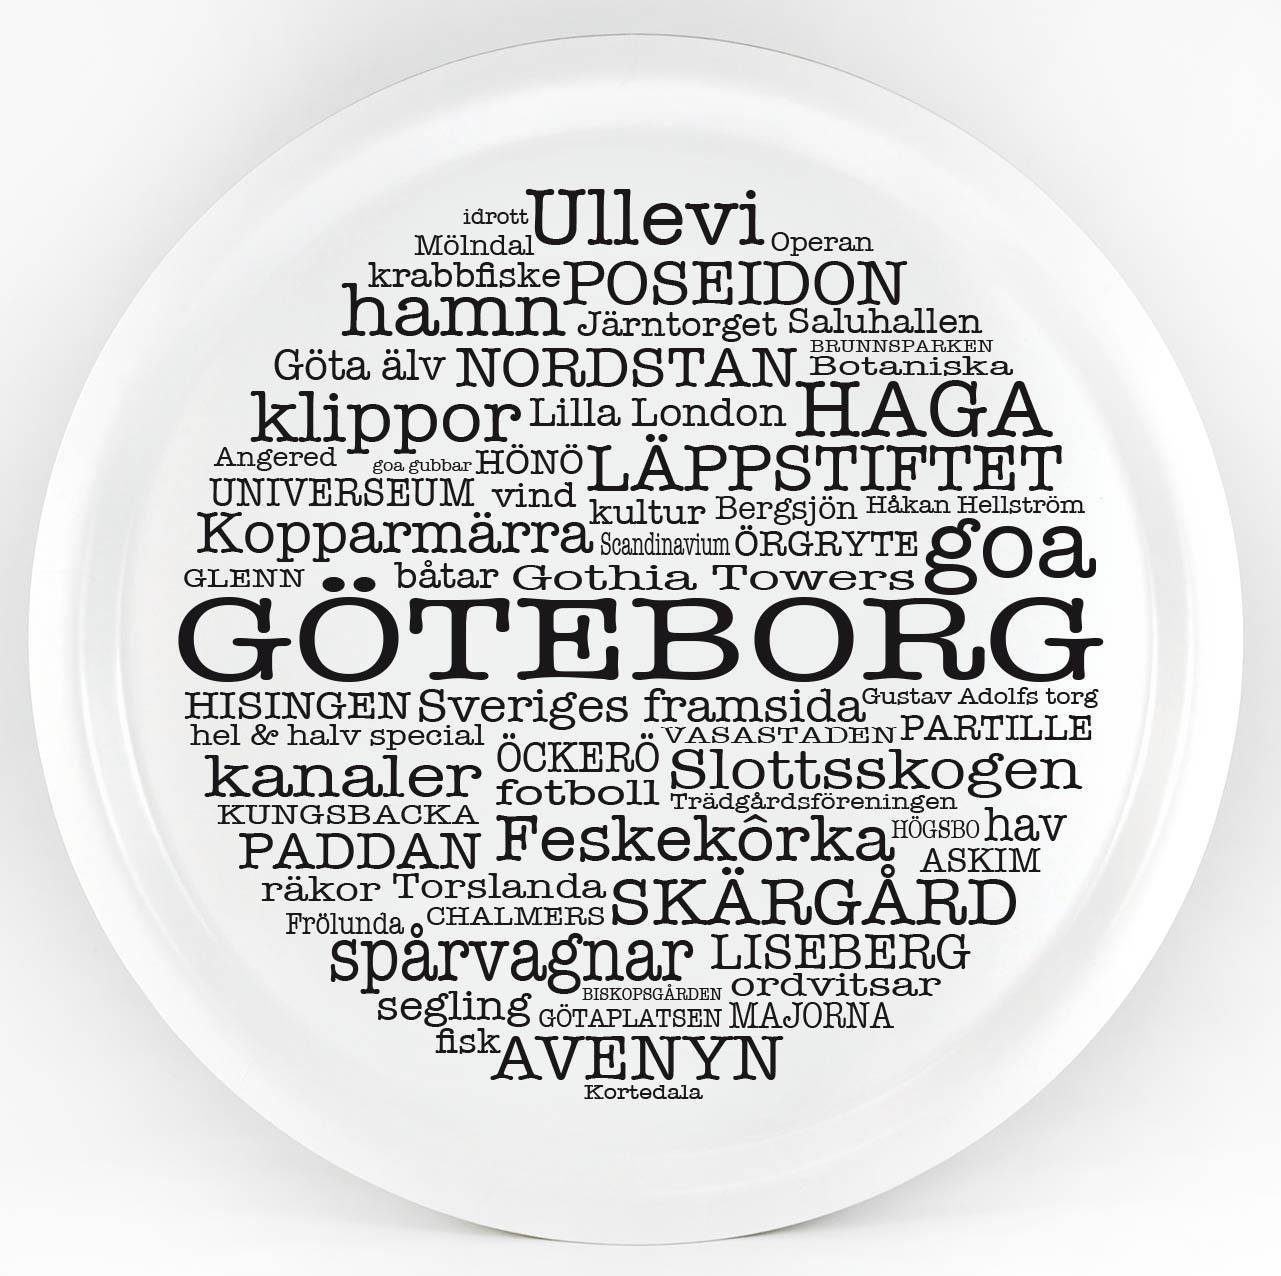 Bricka rund 31 cm, Göteborg, vit/svart text